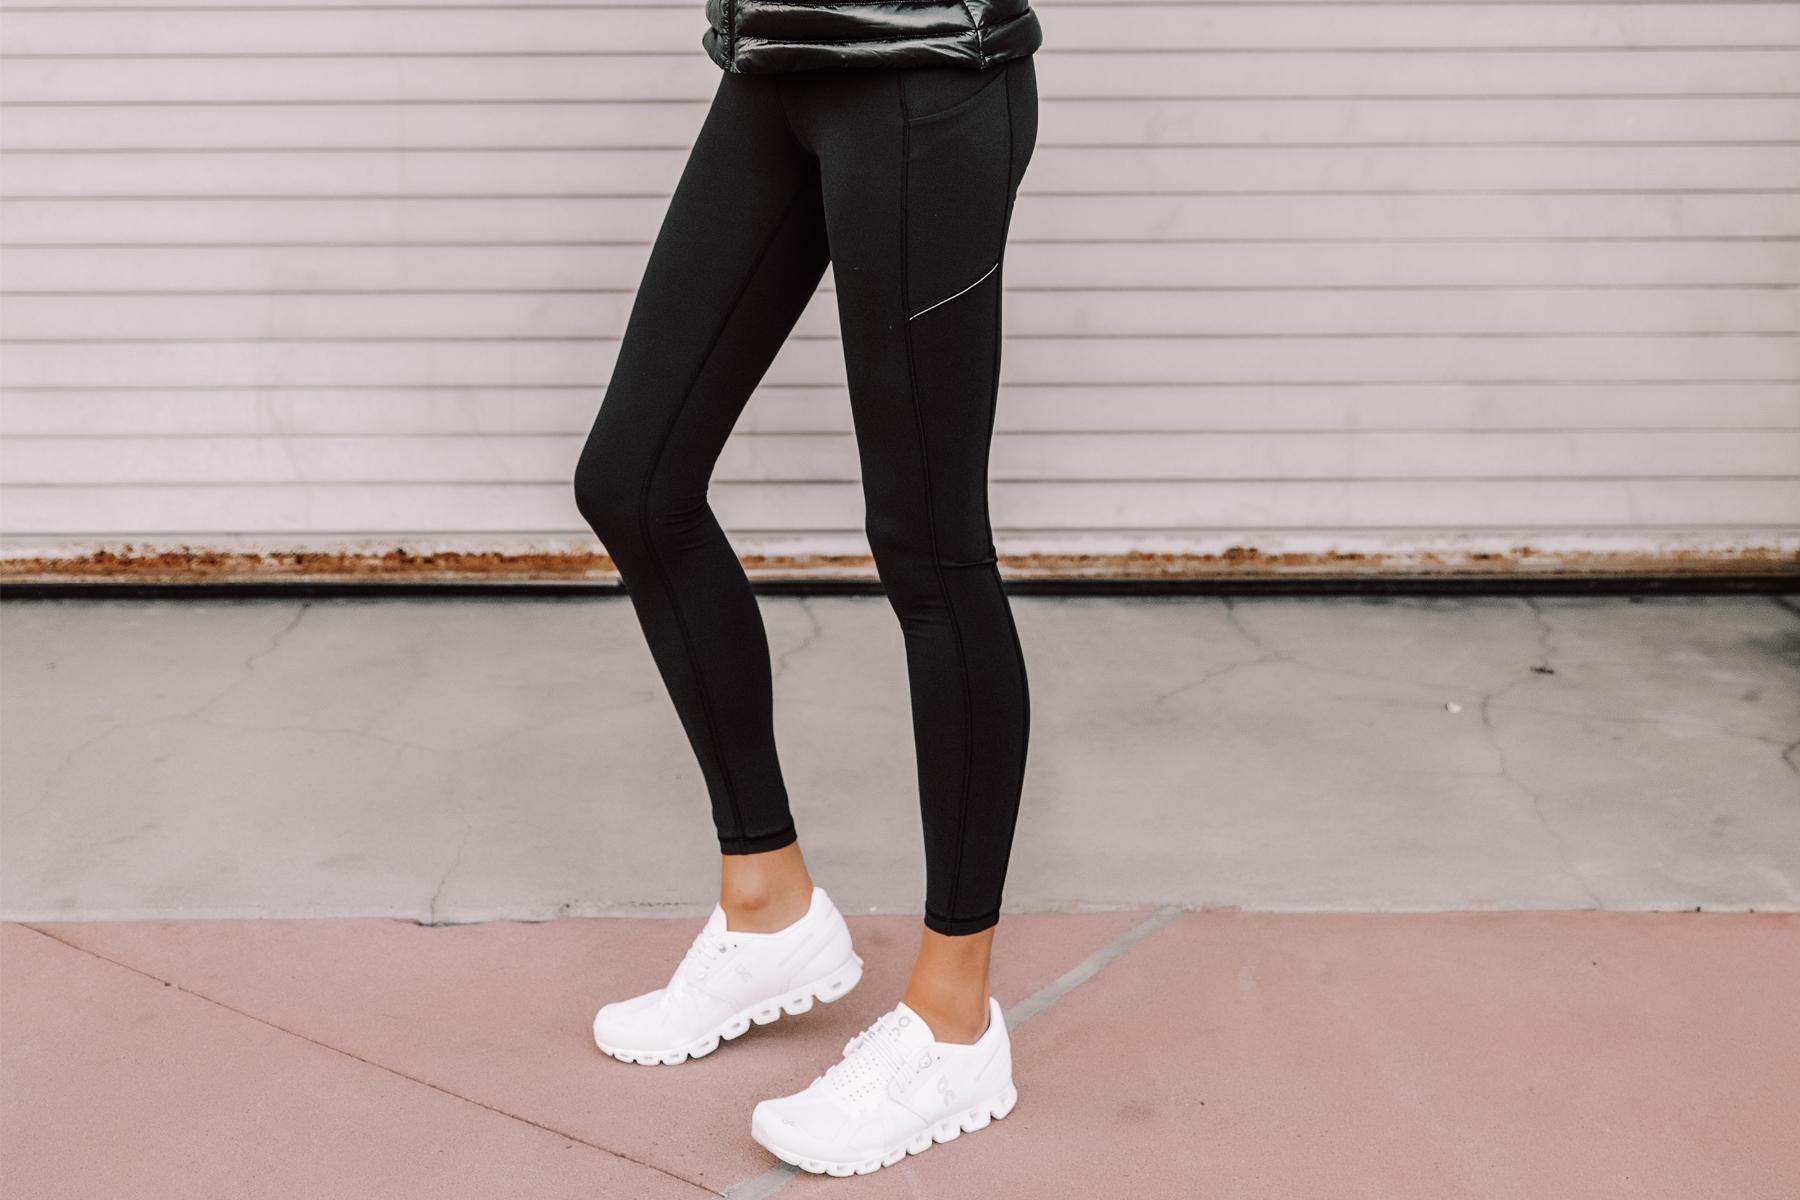 Fashion Jackson Wearing lululemon Speed Up Leggings Black